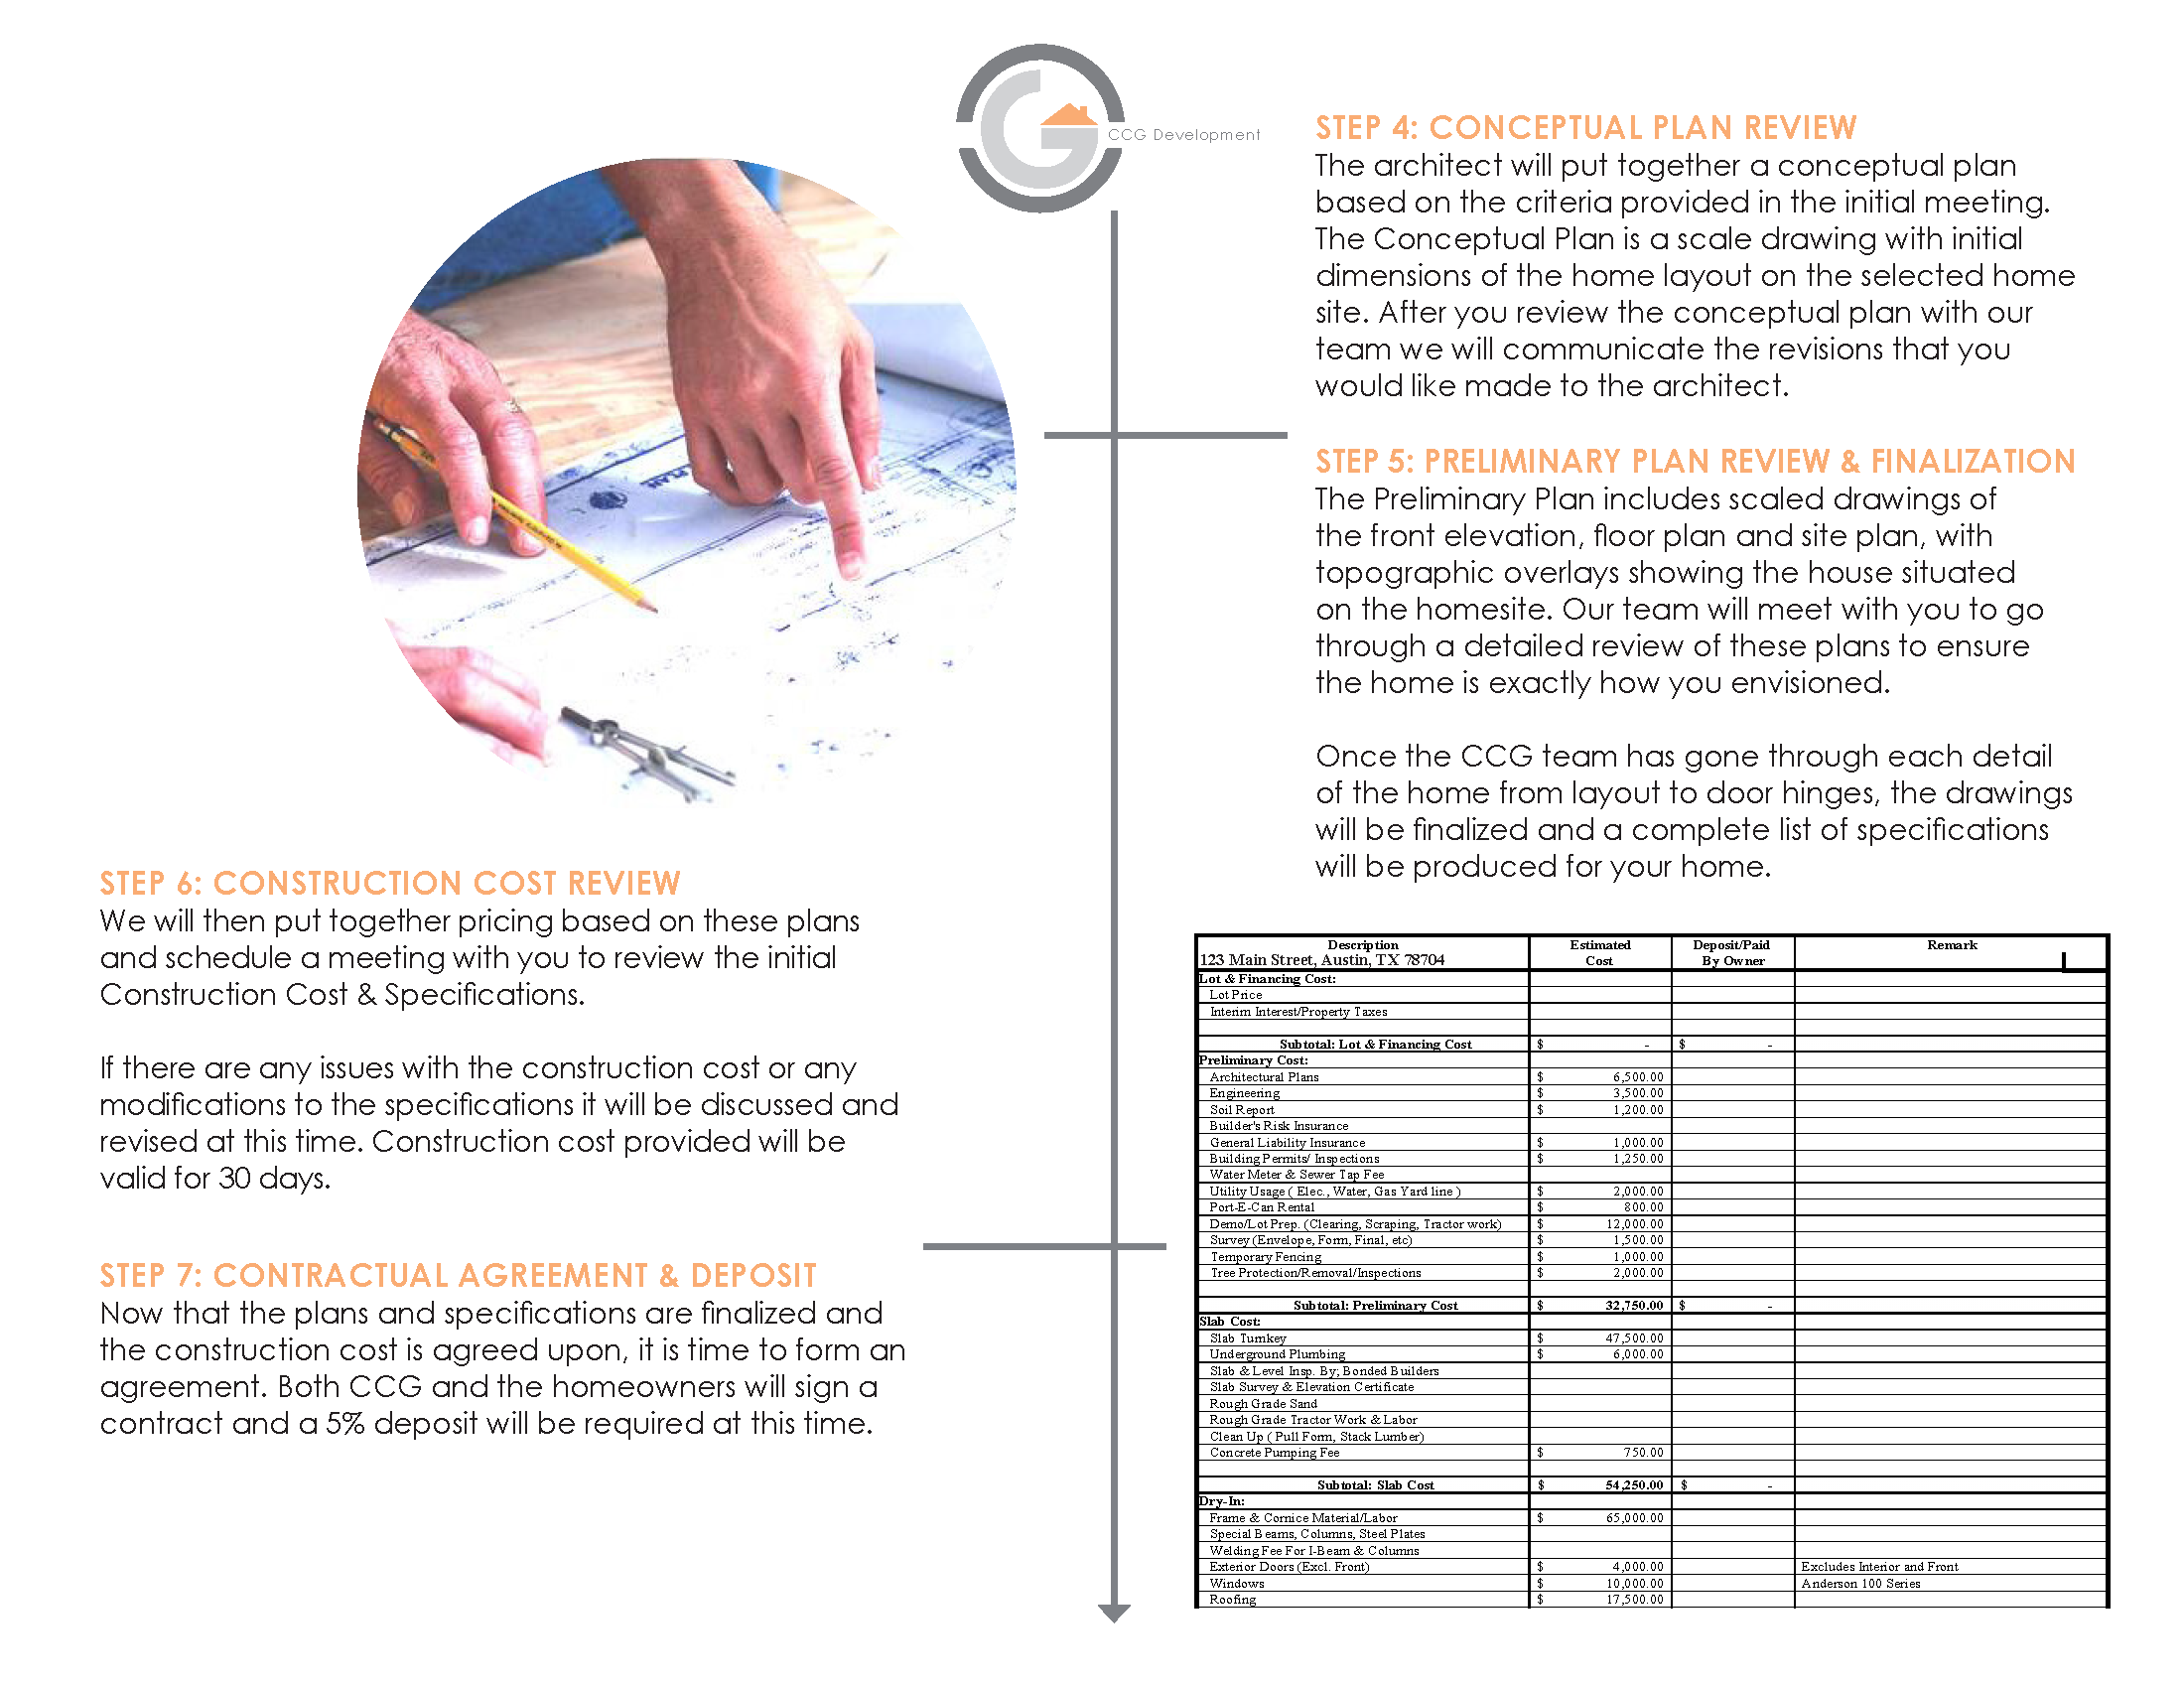 CCG Development Custom Home Process Chart V2 - Slides_Page_2.png